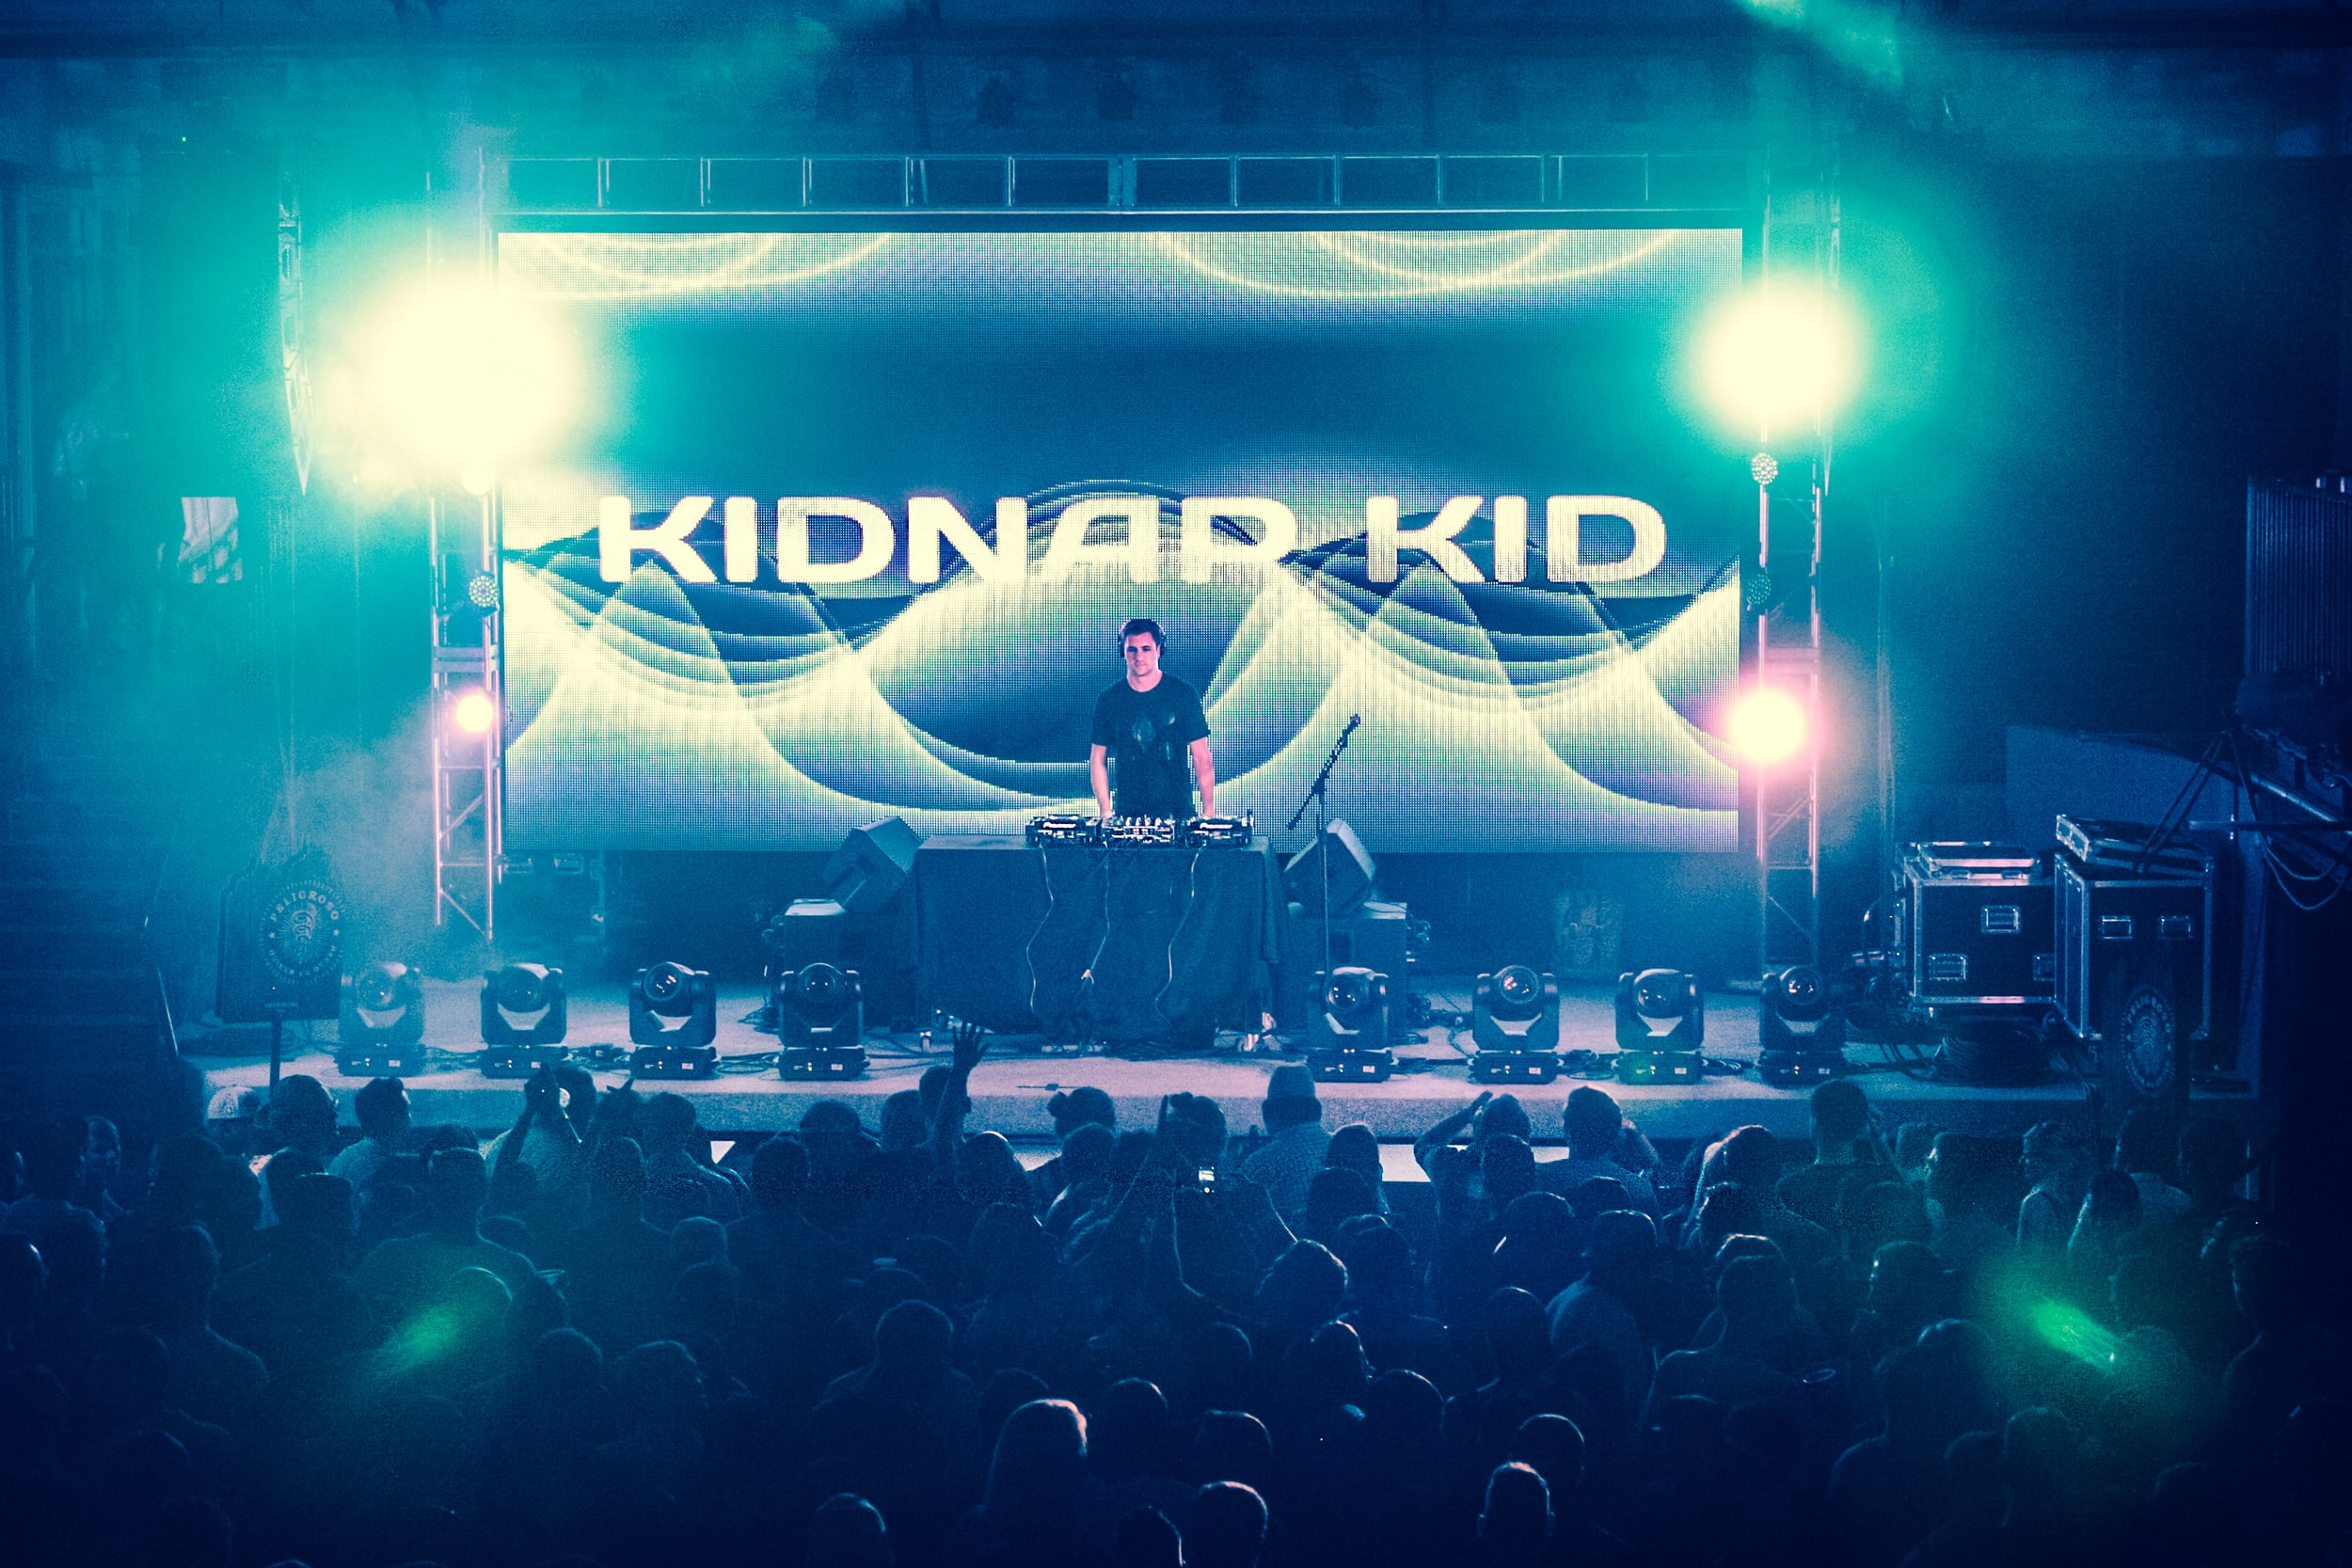 Kidnap Kid